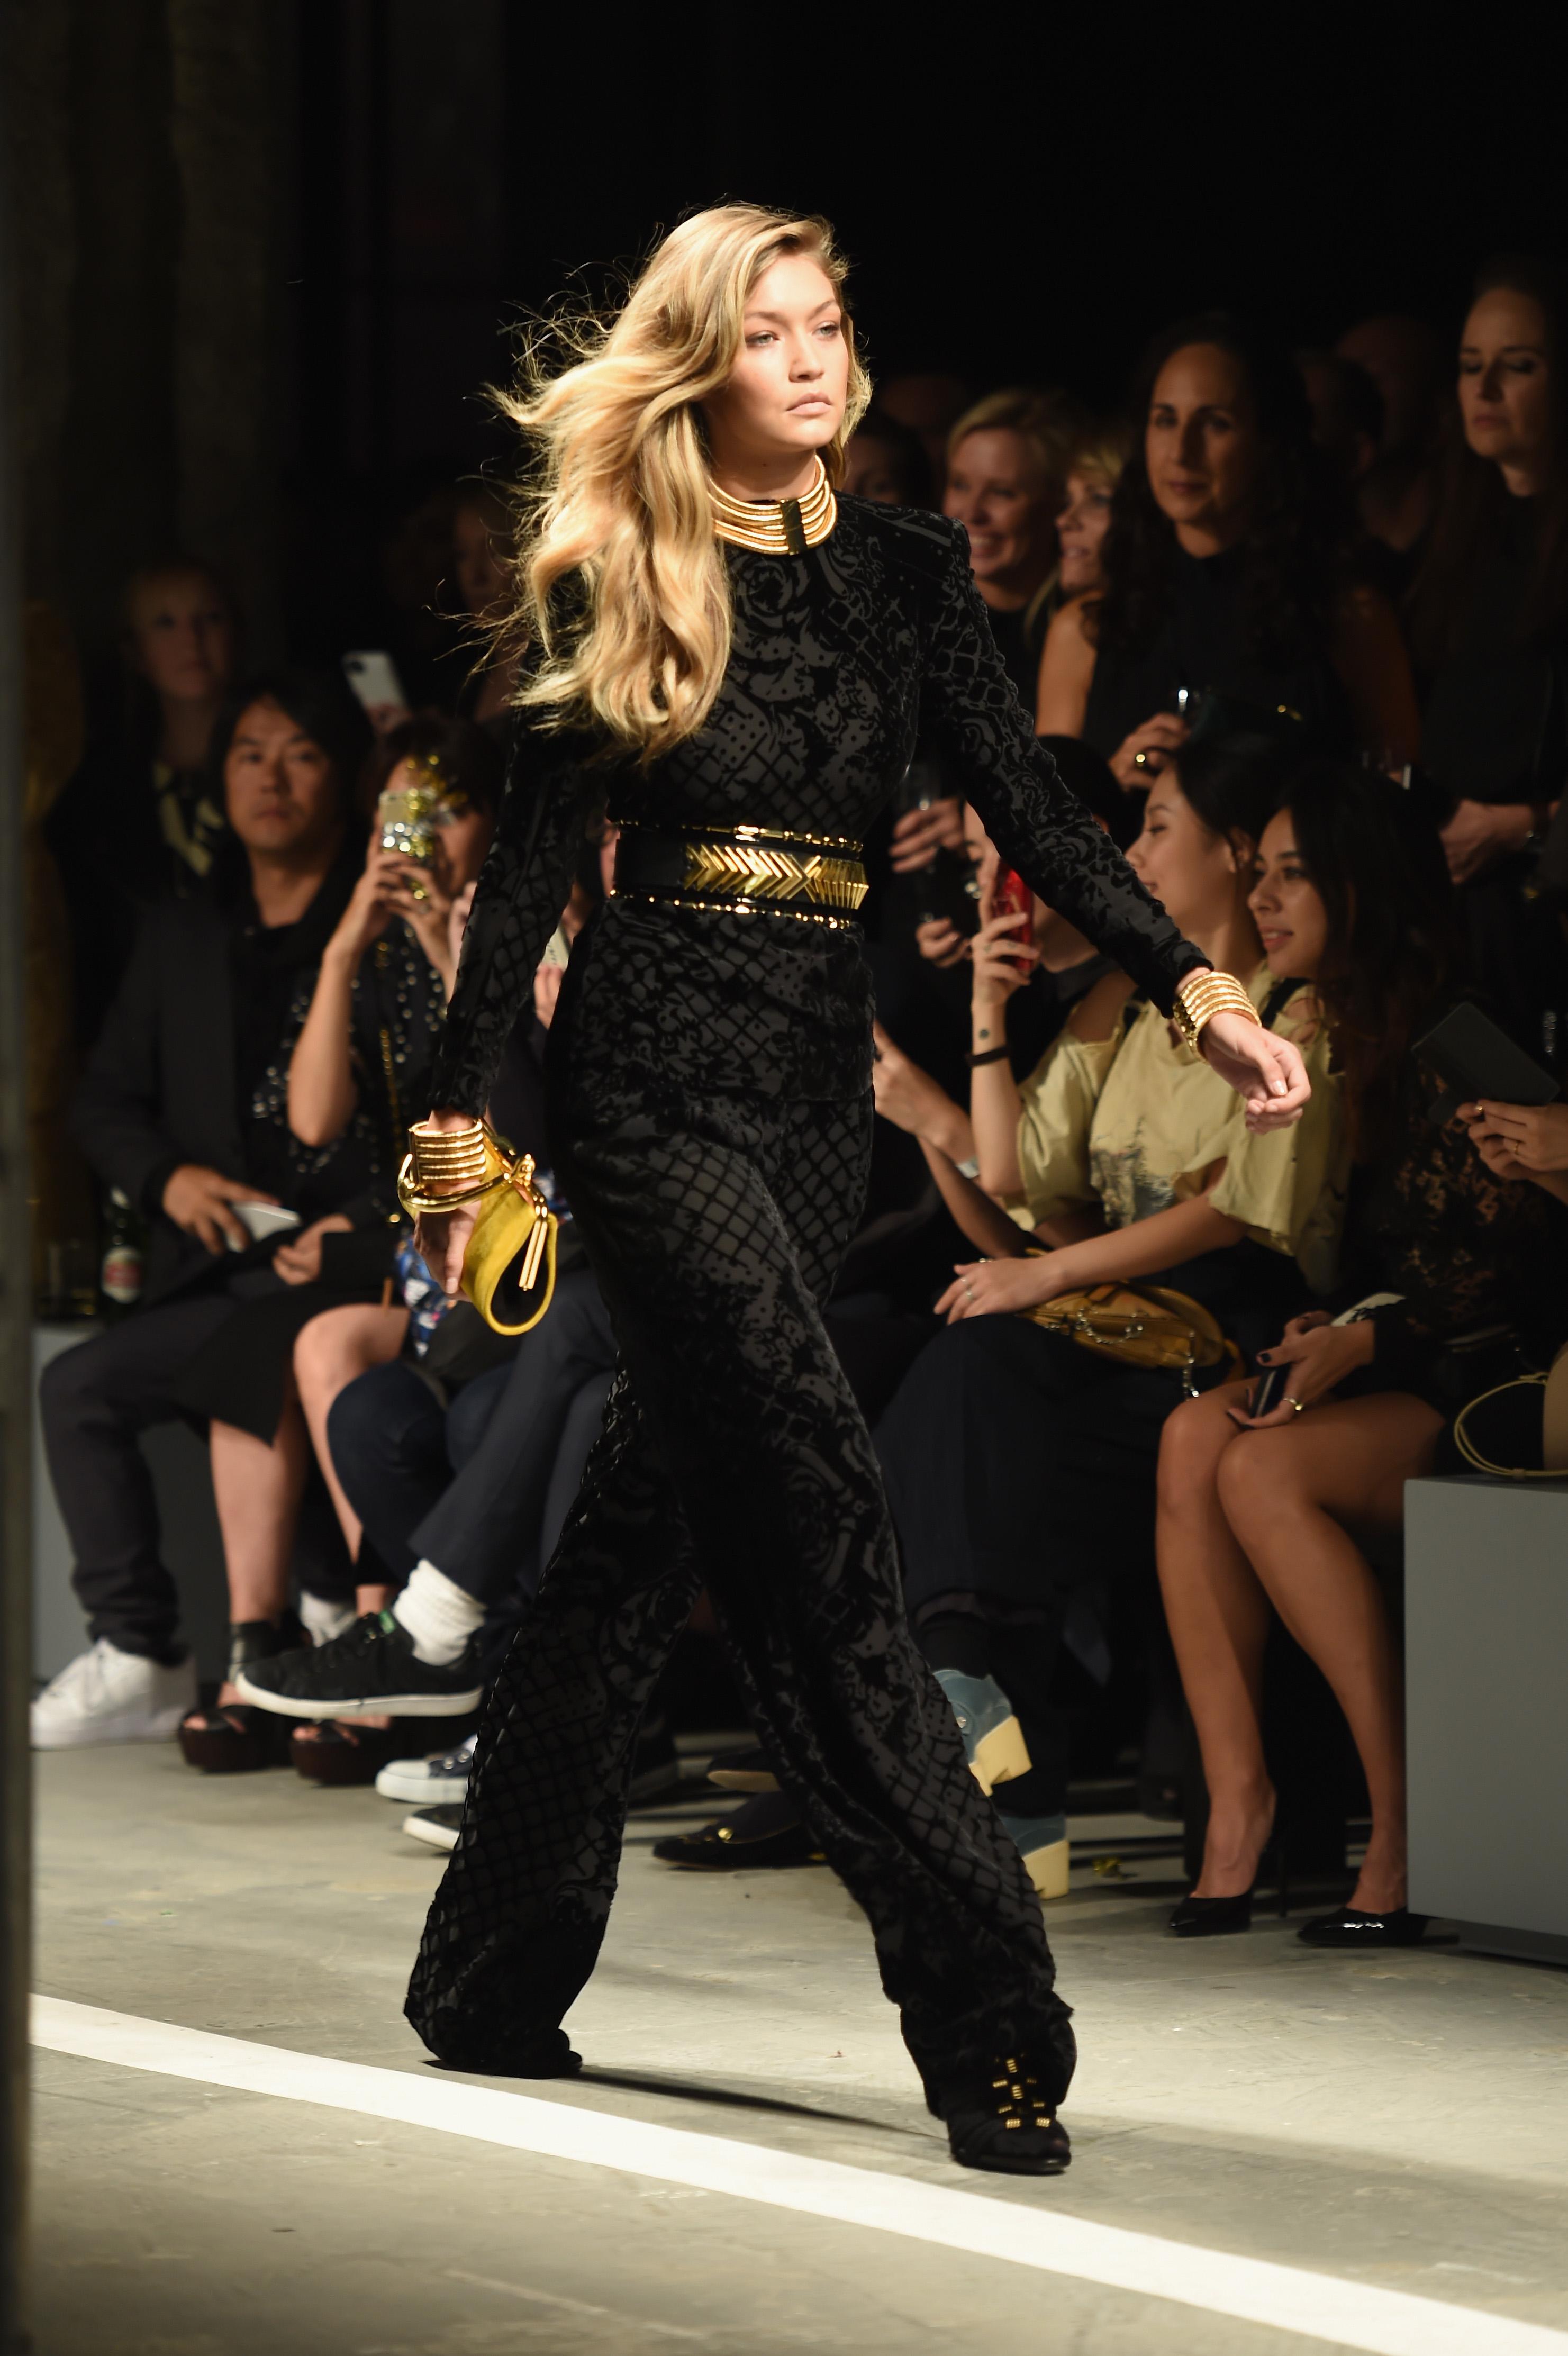 dbe2648fa3032 Gigi Hadid To Walk Victoria s Secret Fashion Show